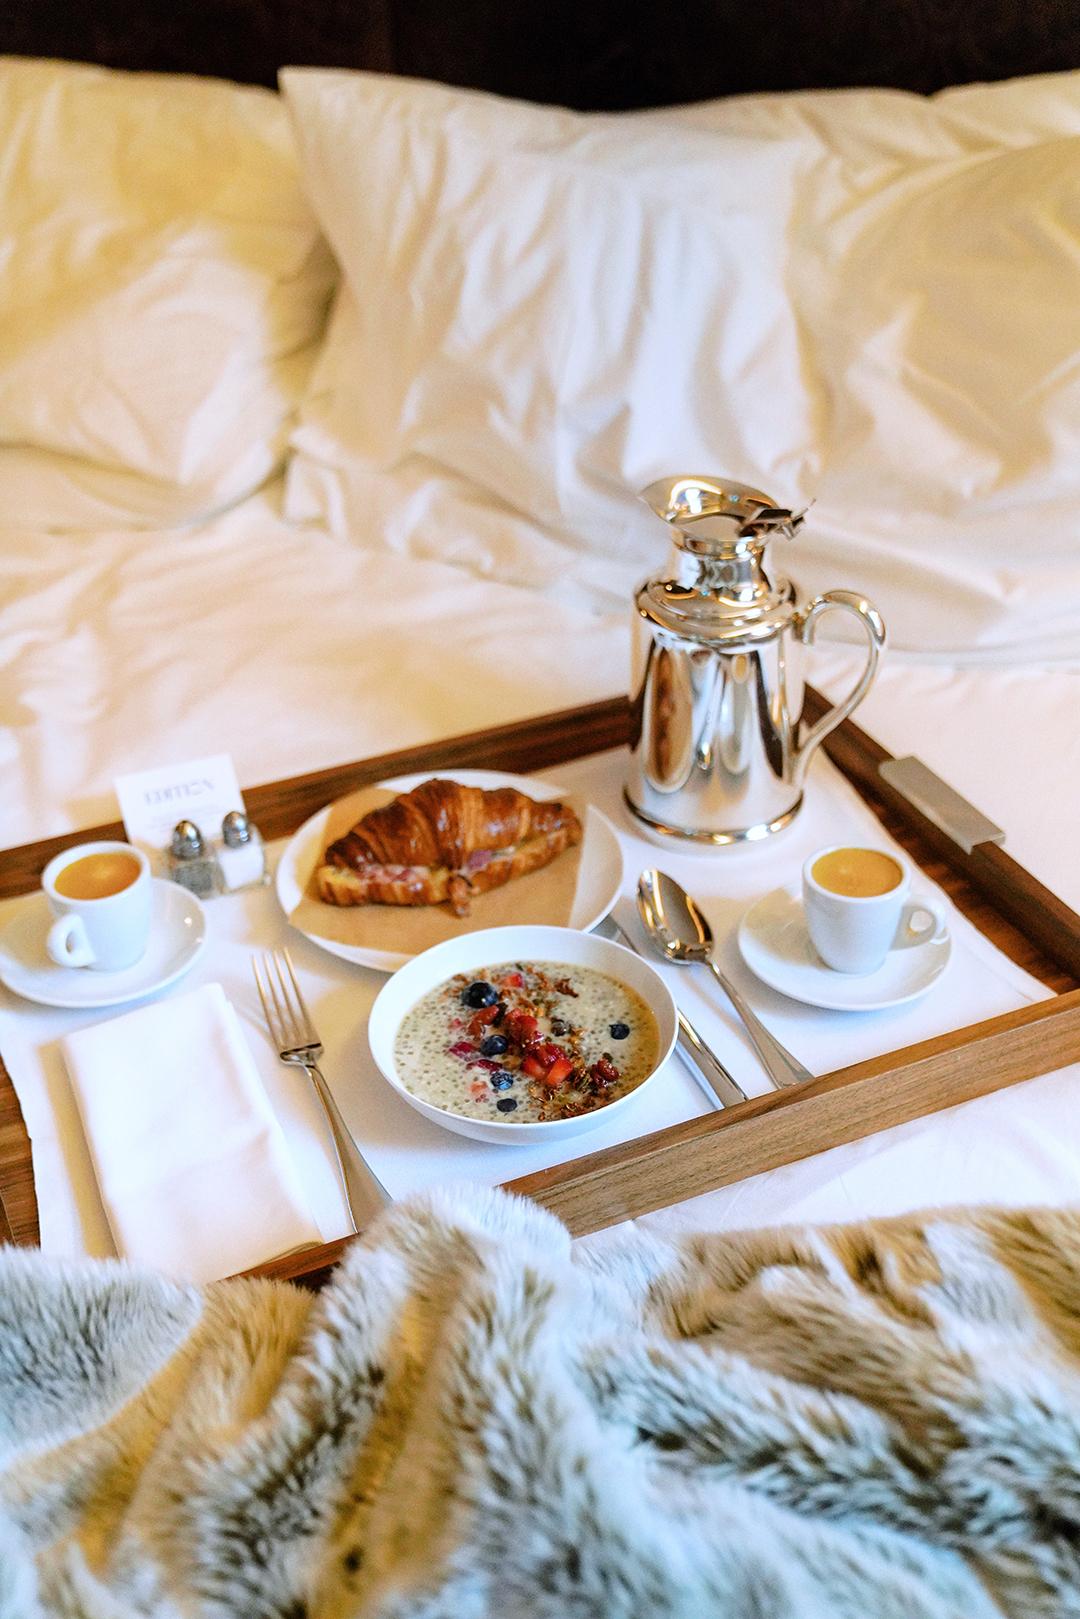 Breakfast in Bed before departure.